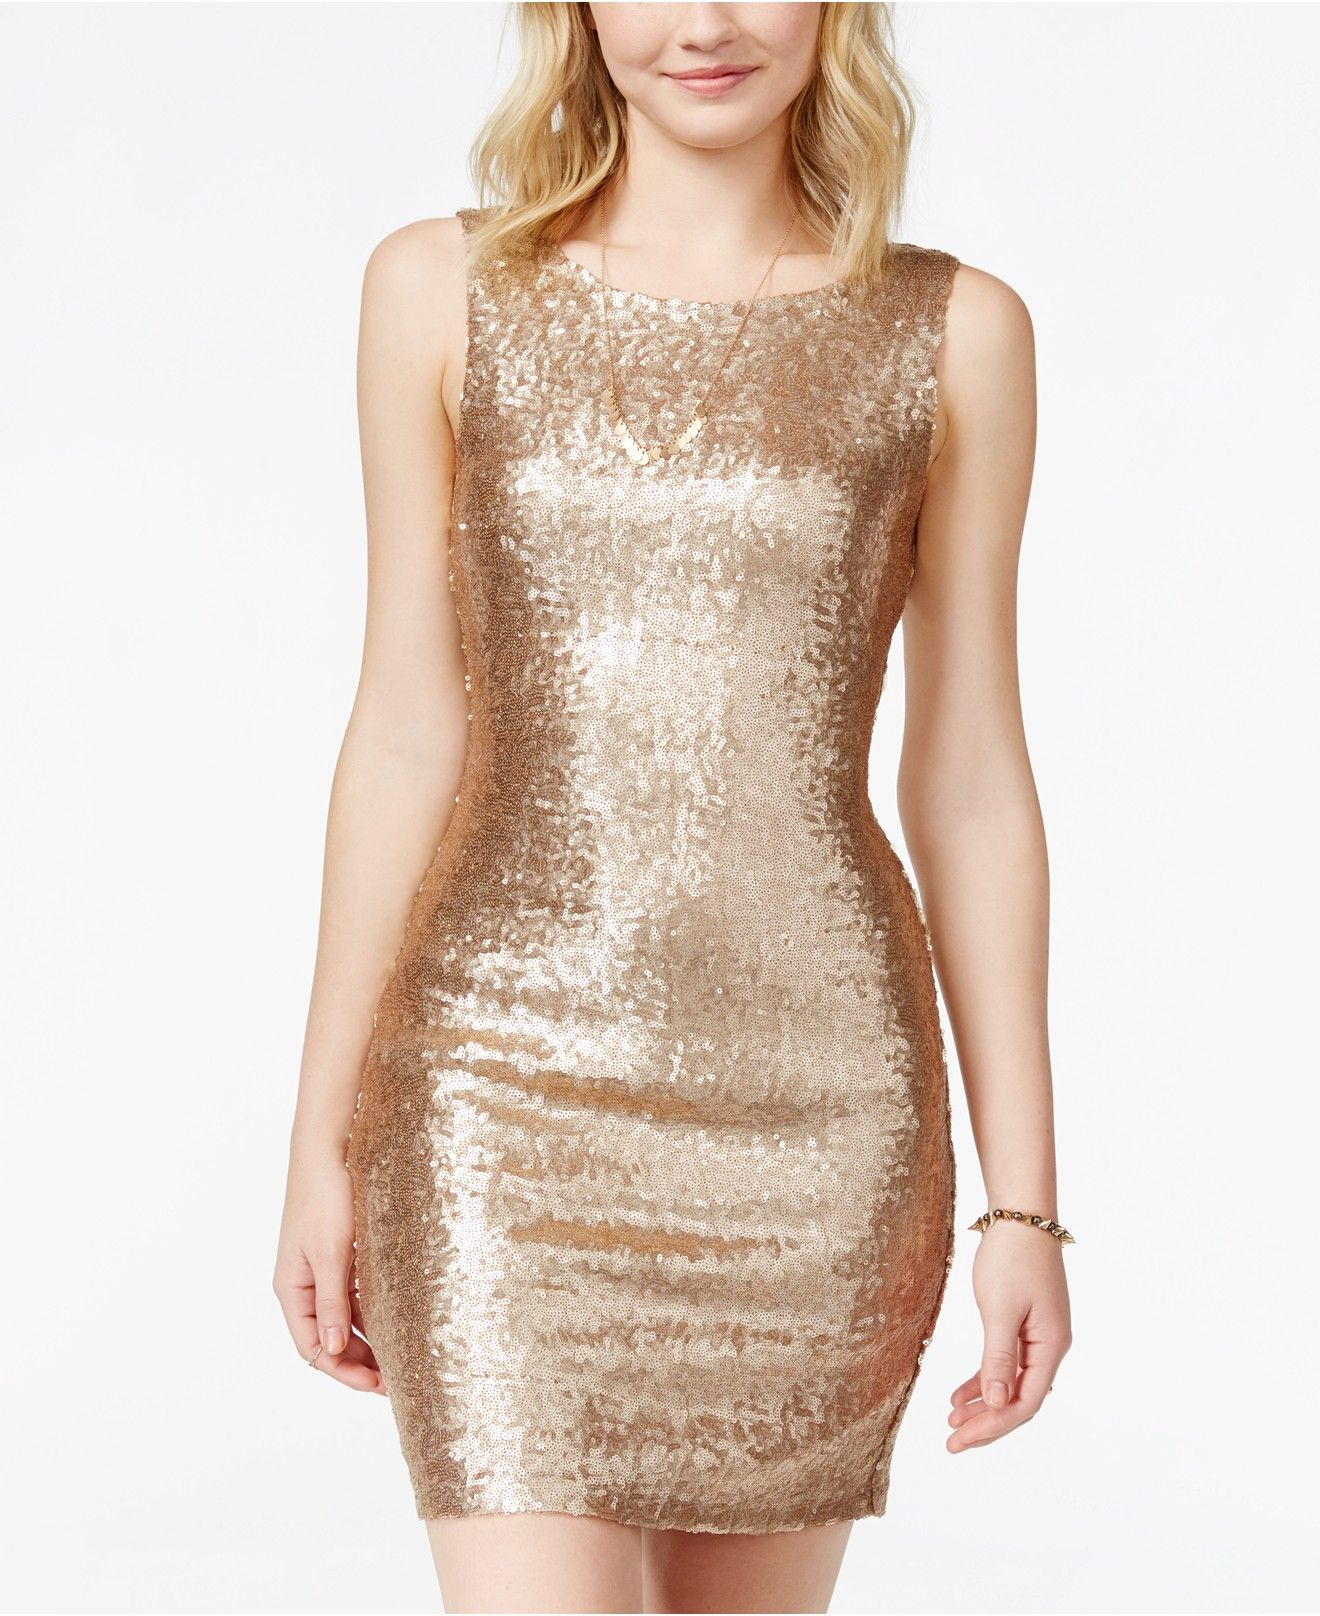 0db280d0b3829 Crystal Doll Juniors' Sequin Bodycon Tank Dress - Juniors Dresses - Macy's